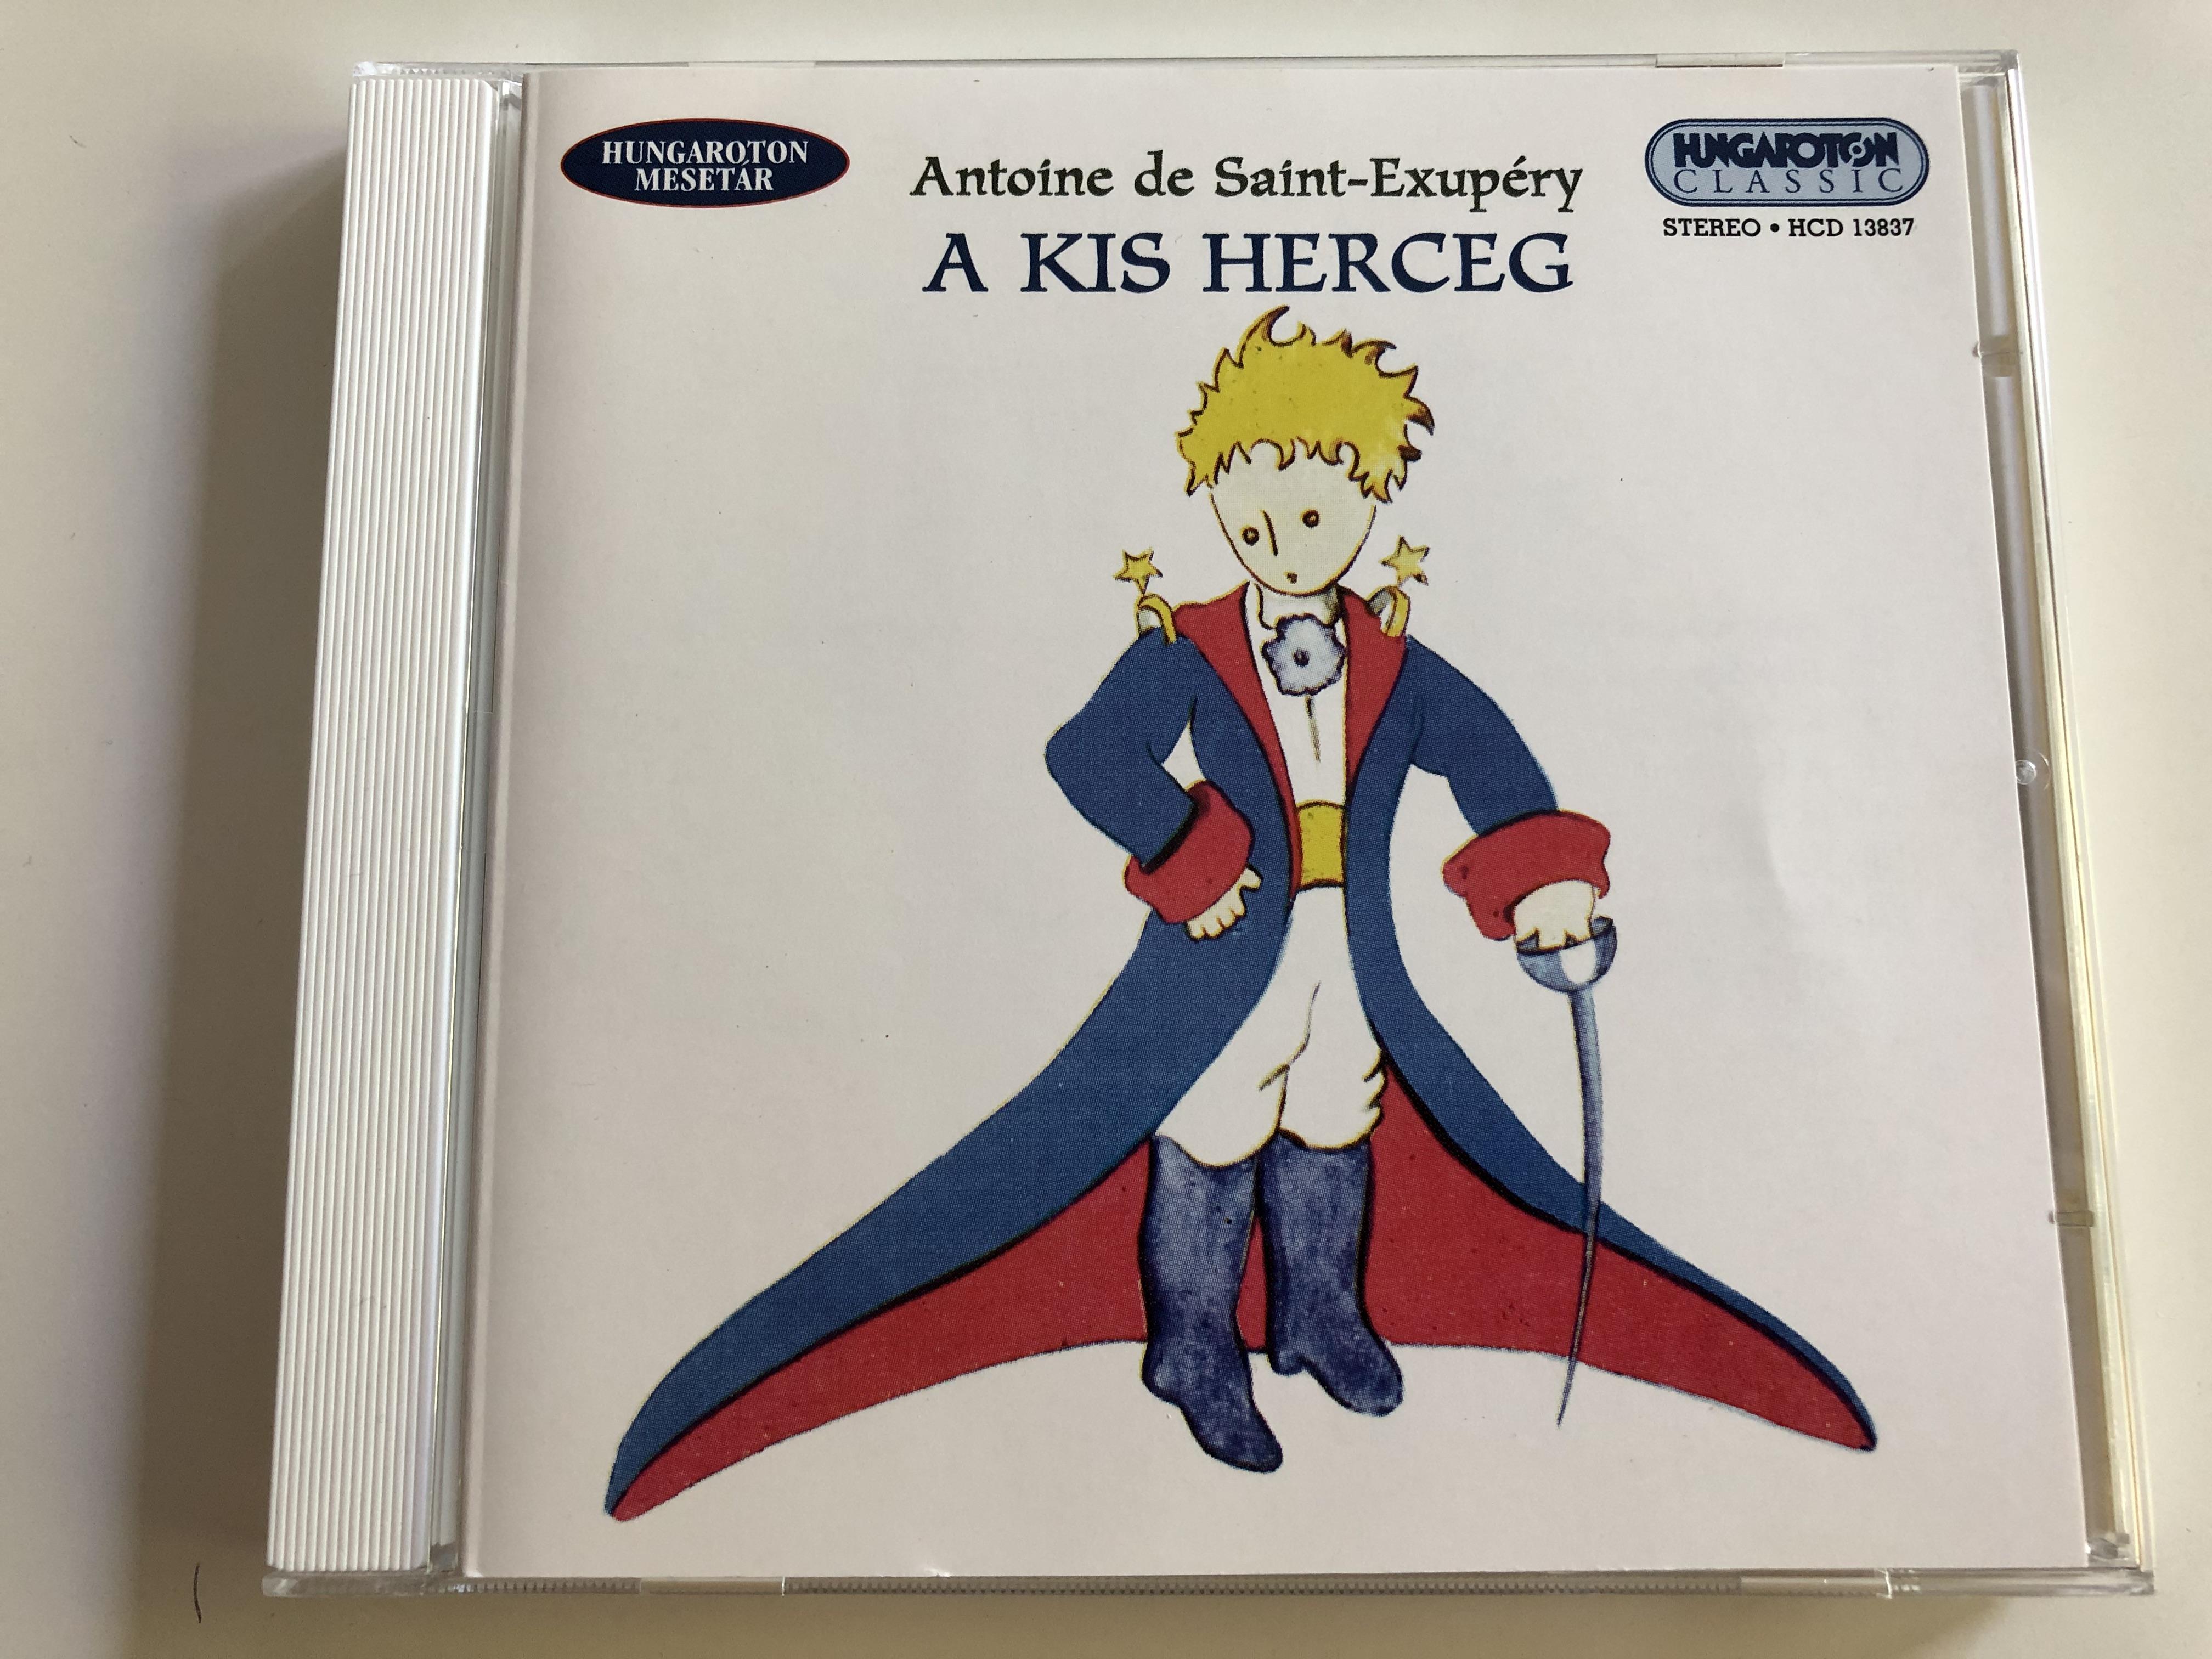 a-kis-herceg-by-antoine-de-saint-exup-ry-audio-book-hungaroton-directed-by-marton-l-szl-voices-g-bor-mikl-s-pr-kai-istv-n-gr-nwald-kati-hal-sz-judit-p-ger-antal-le-petit-prince-hungarian-audio-book-hcd13837-1-.jpg